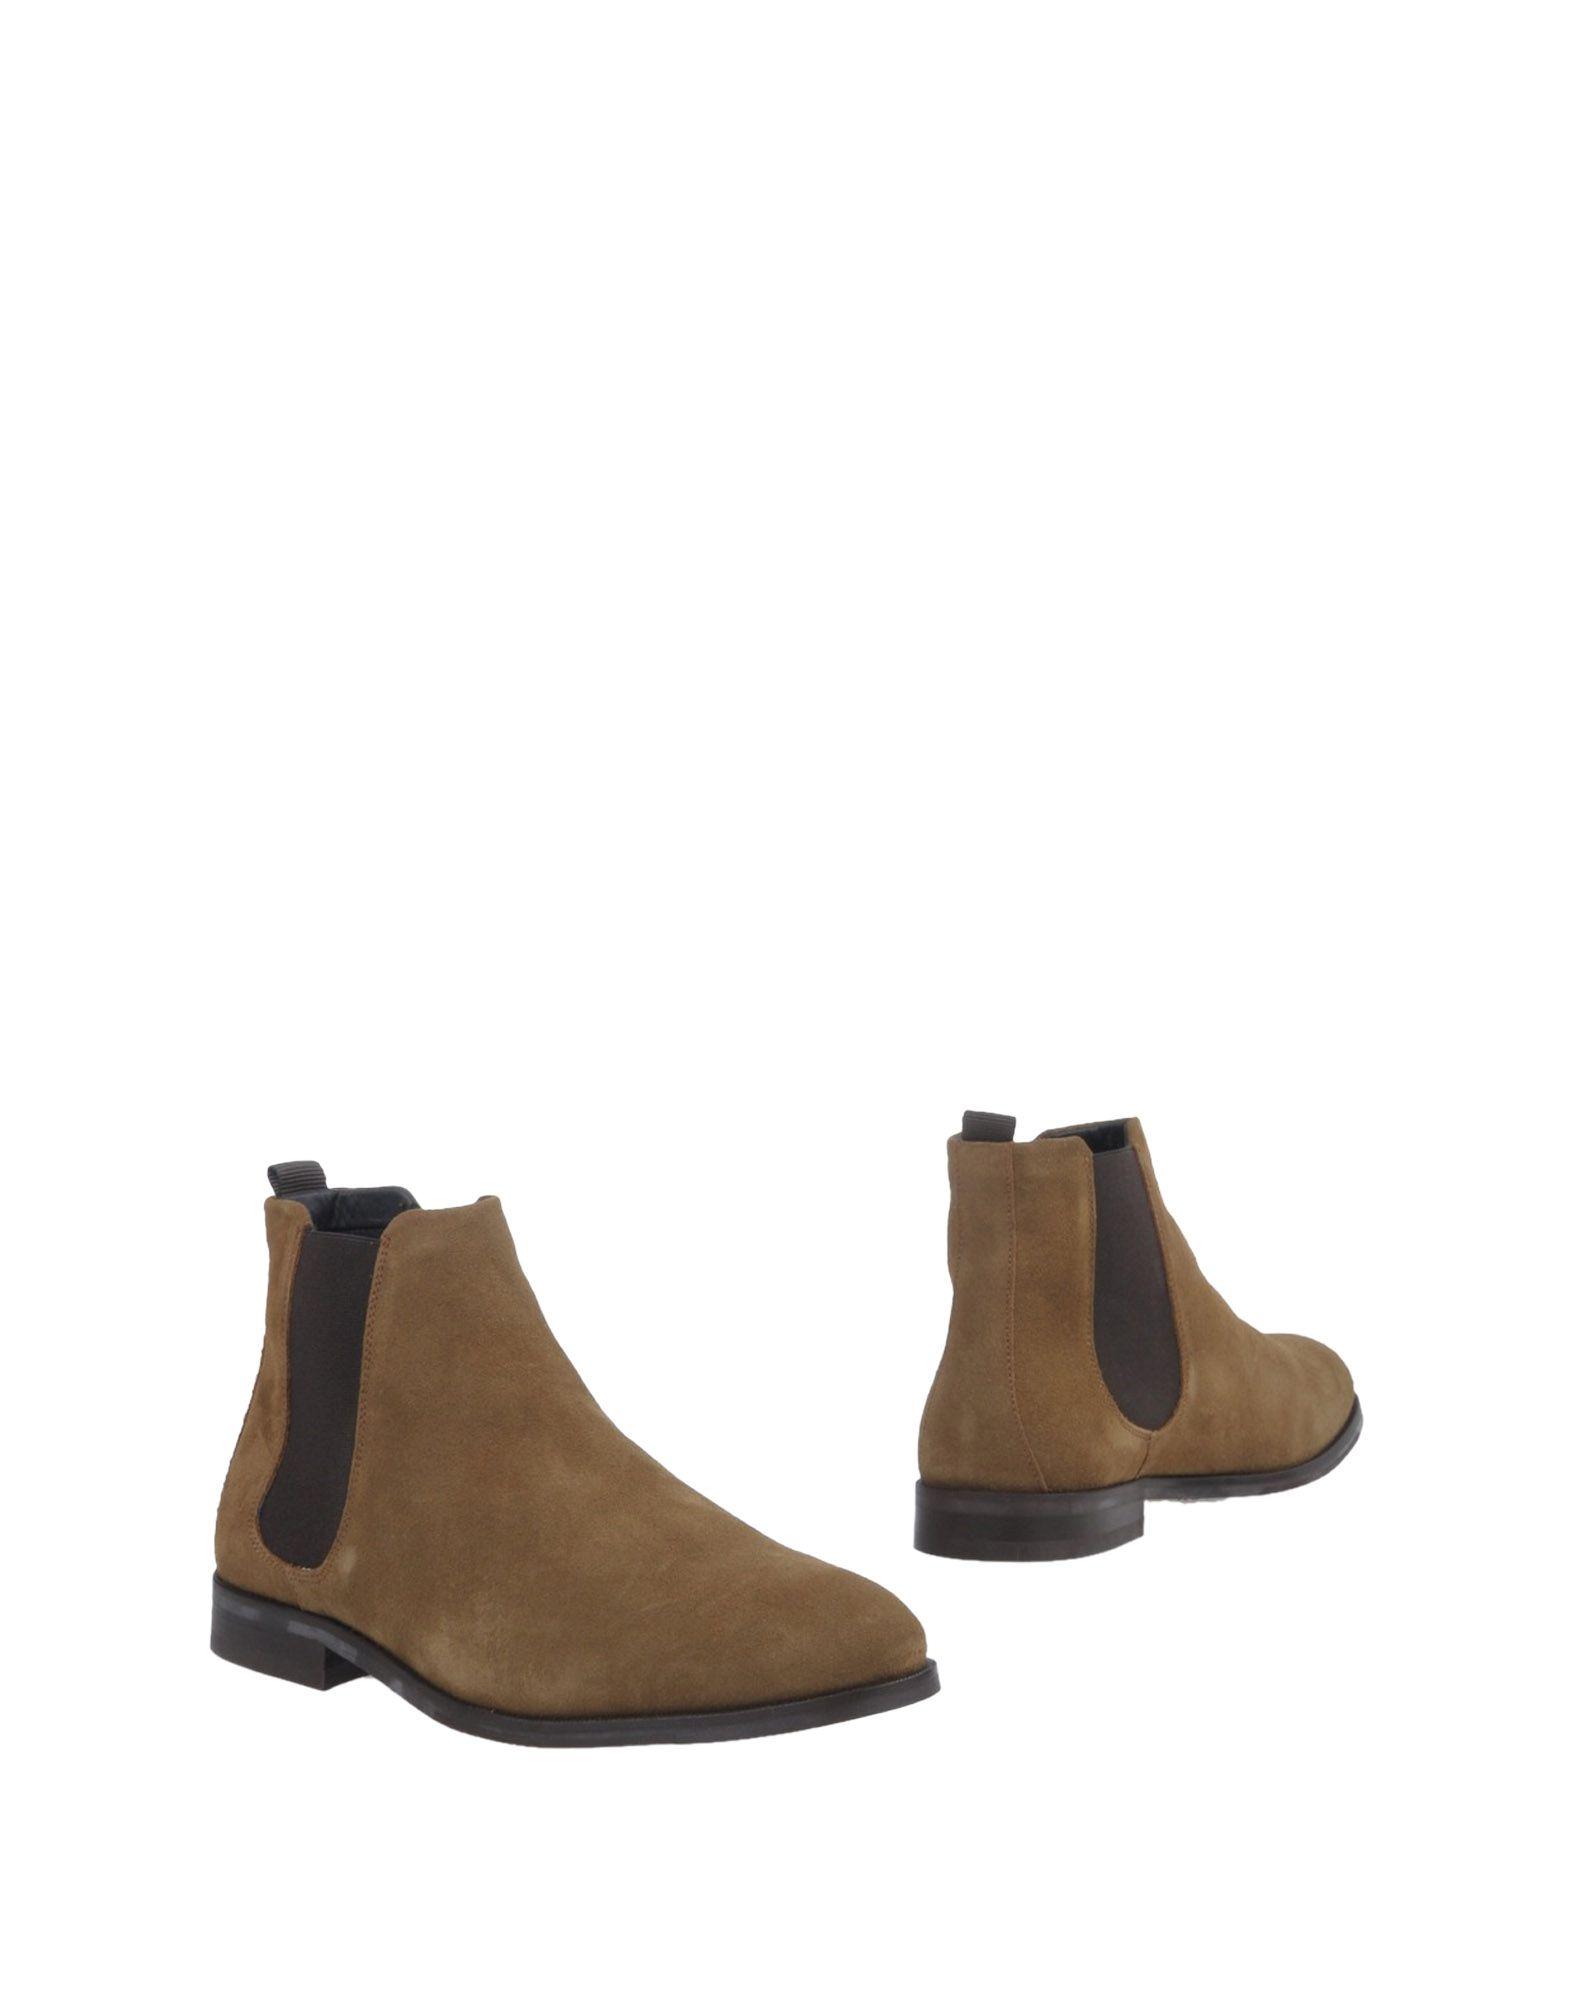 ROYAL REPUBLIQ Полусапоги и высокие ботинки цены онлайн